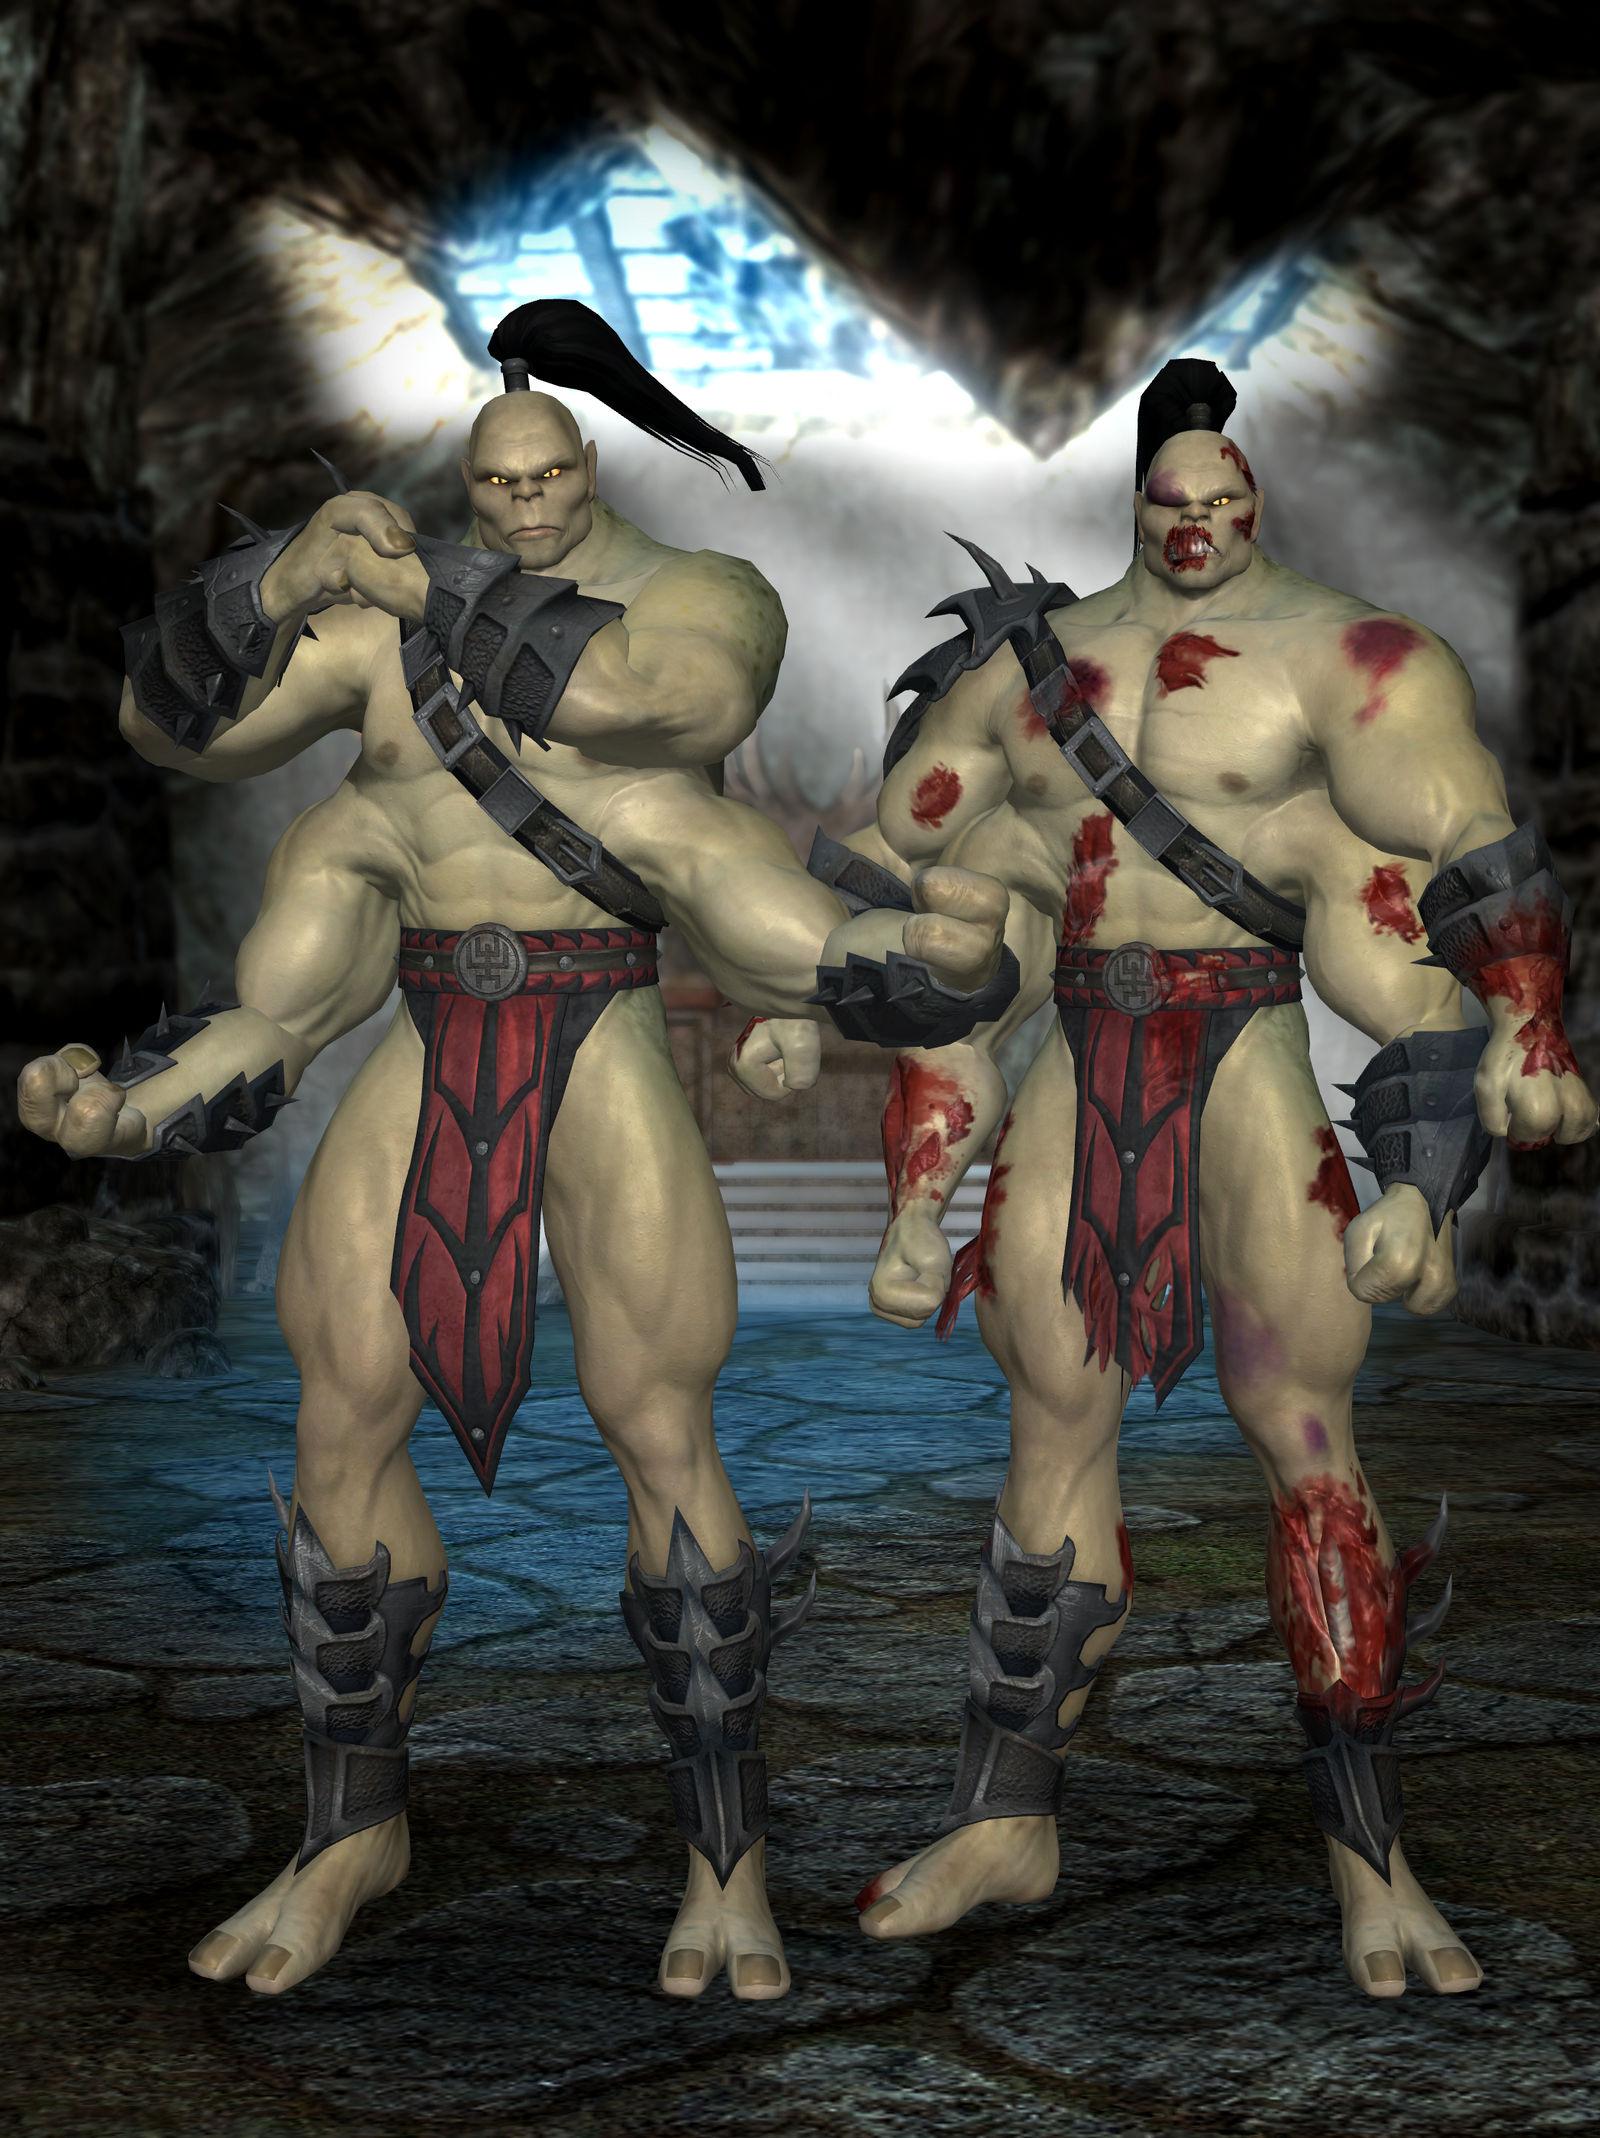 Goro - Mortal Kombat 9 by romero1718 on DeviantArt